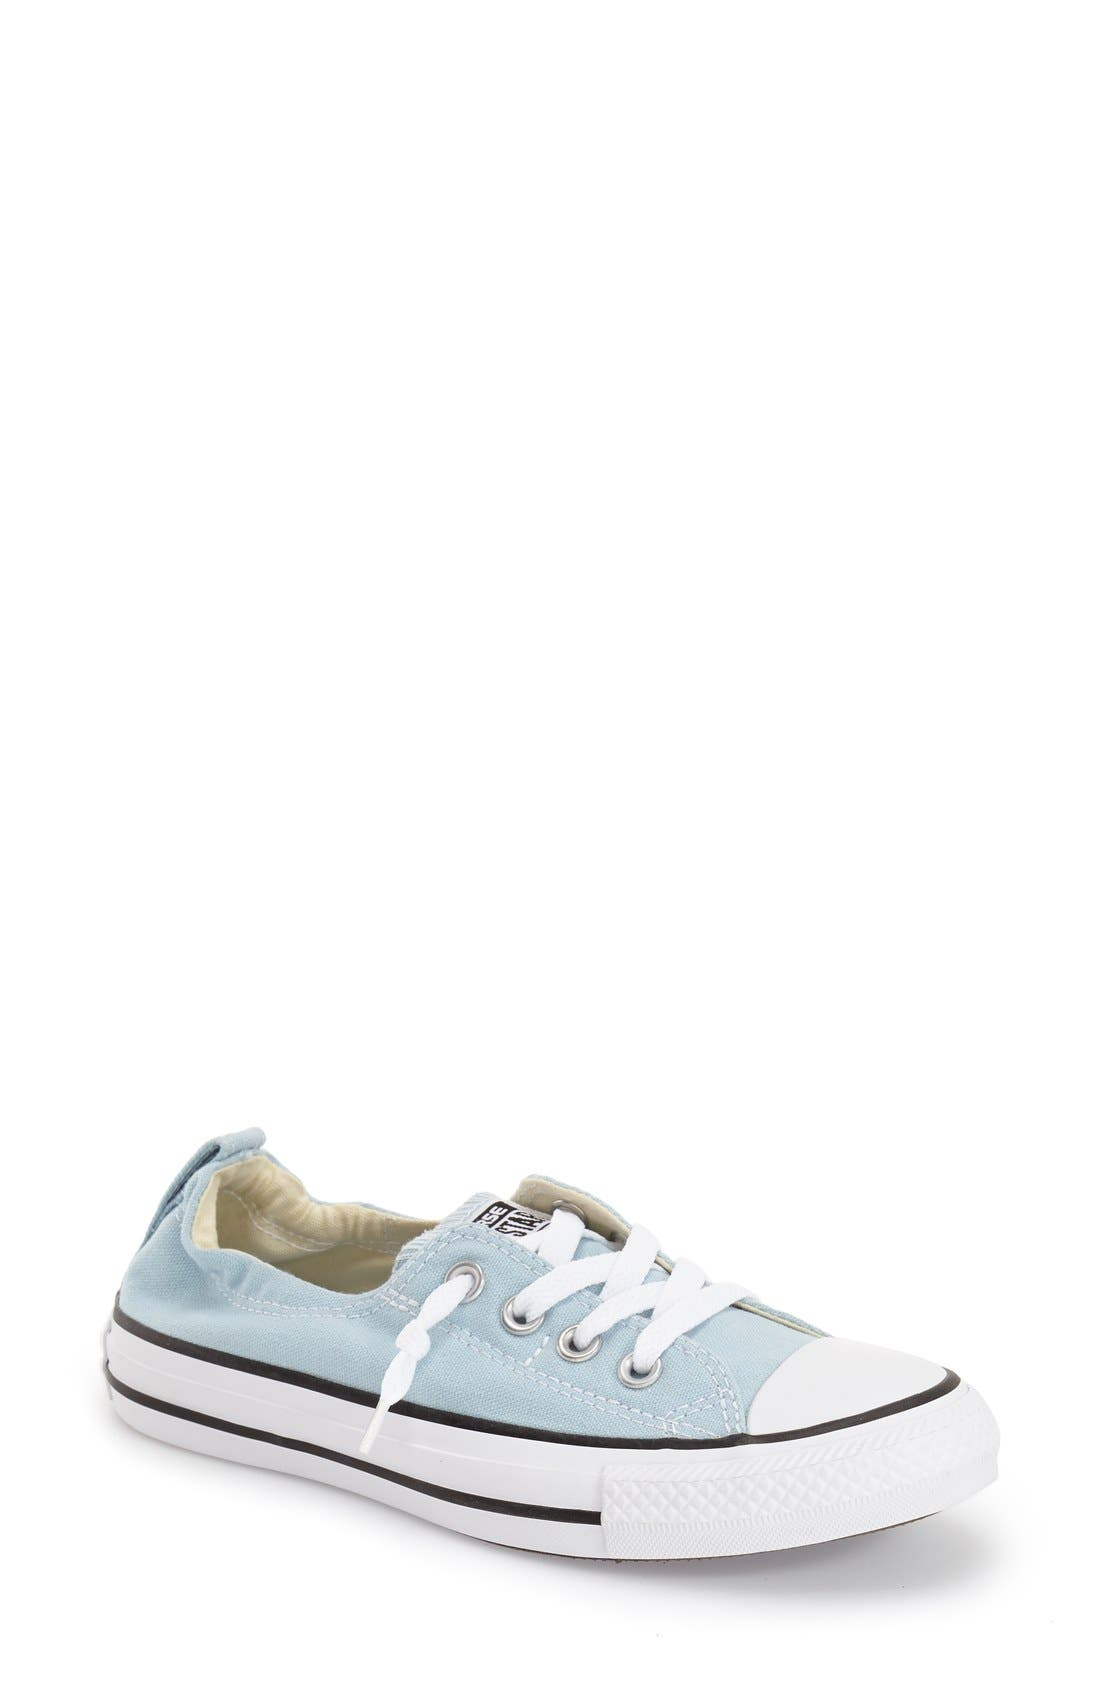 Main Image - Converse Chuck Taylor® All Star® 'Shoreline' Sneaker (Women)